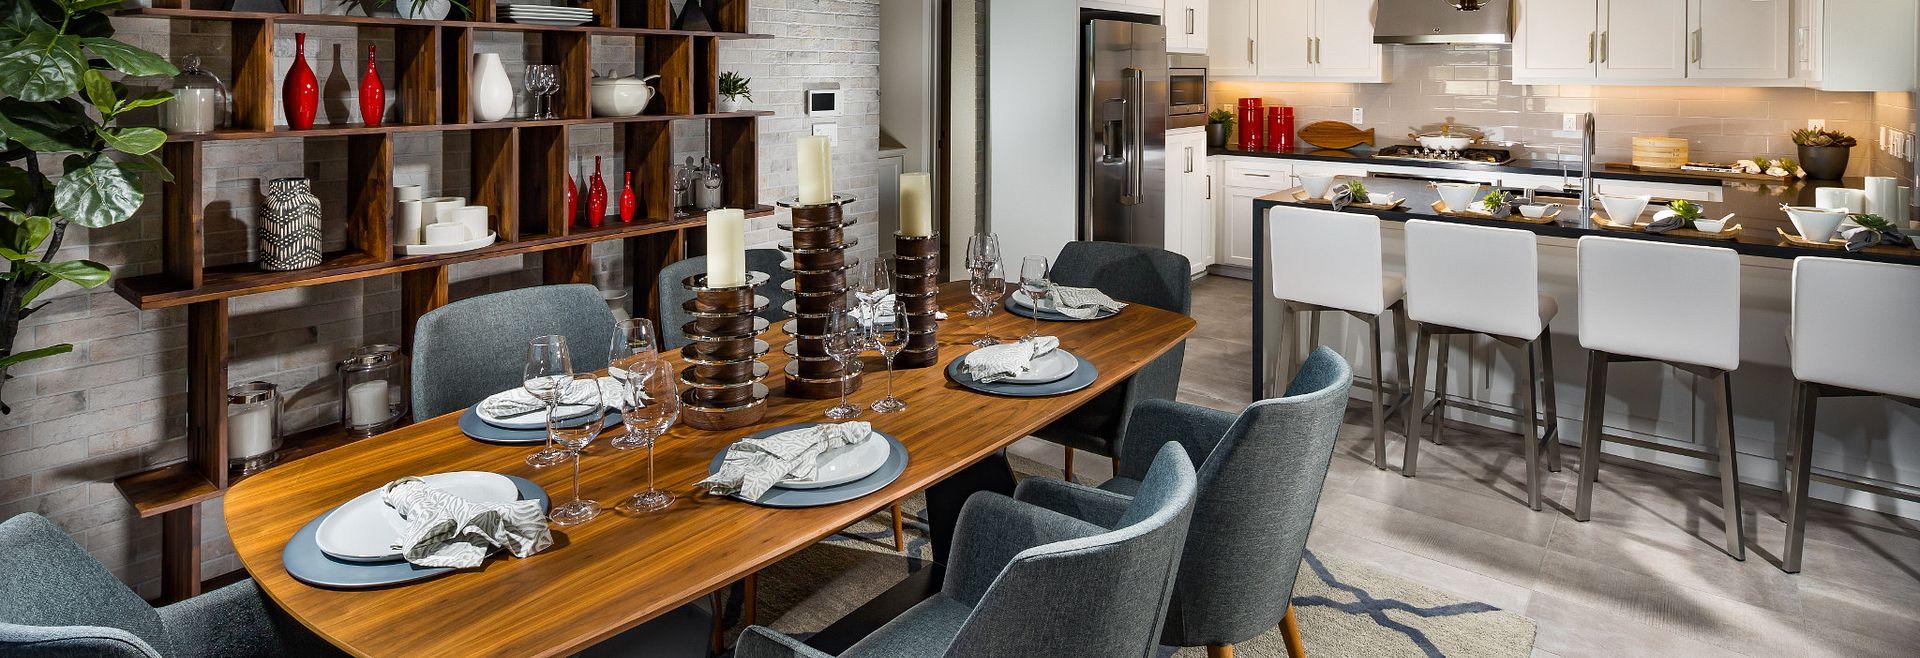 Harmony Plan 7 Sage Livermore Dining Room